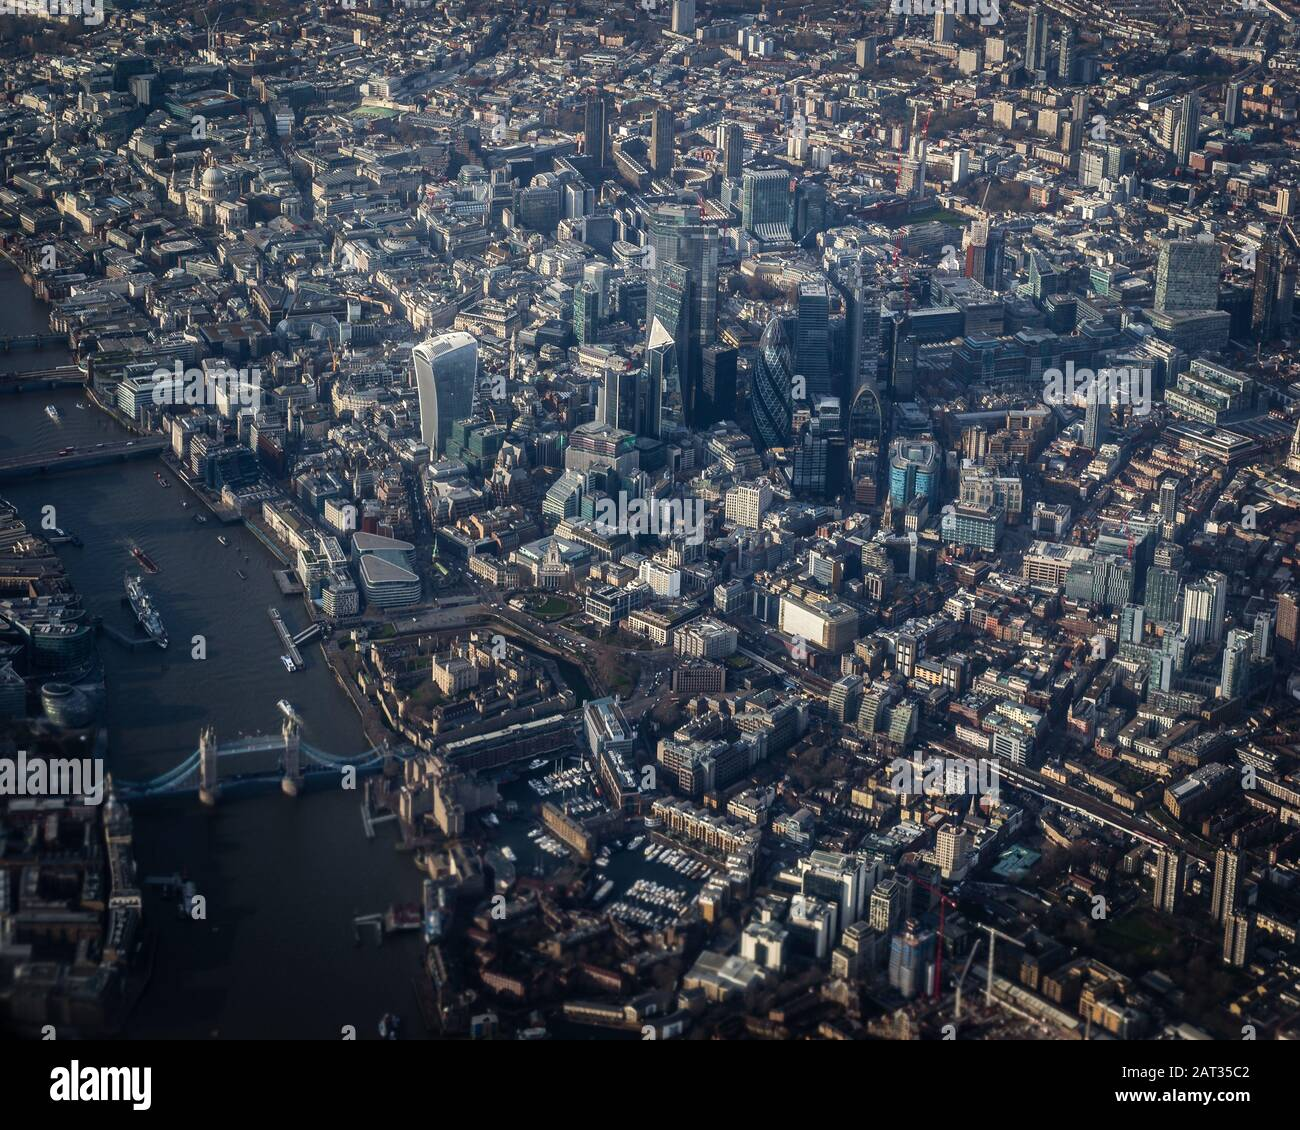 Vista aérea de Londres. Foto de stock